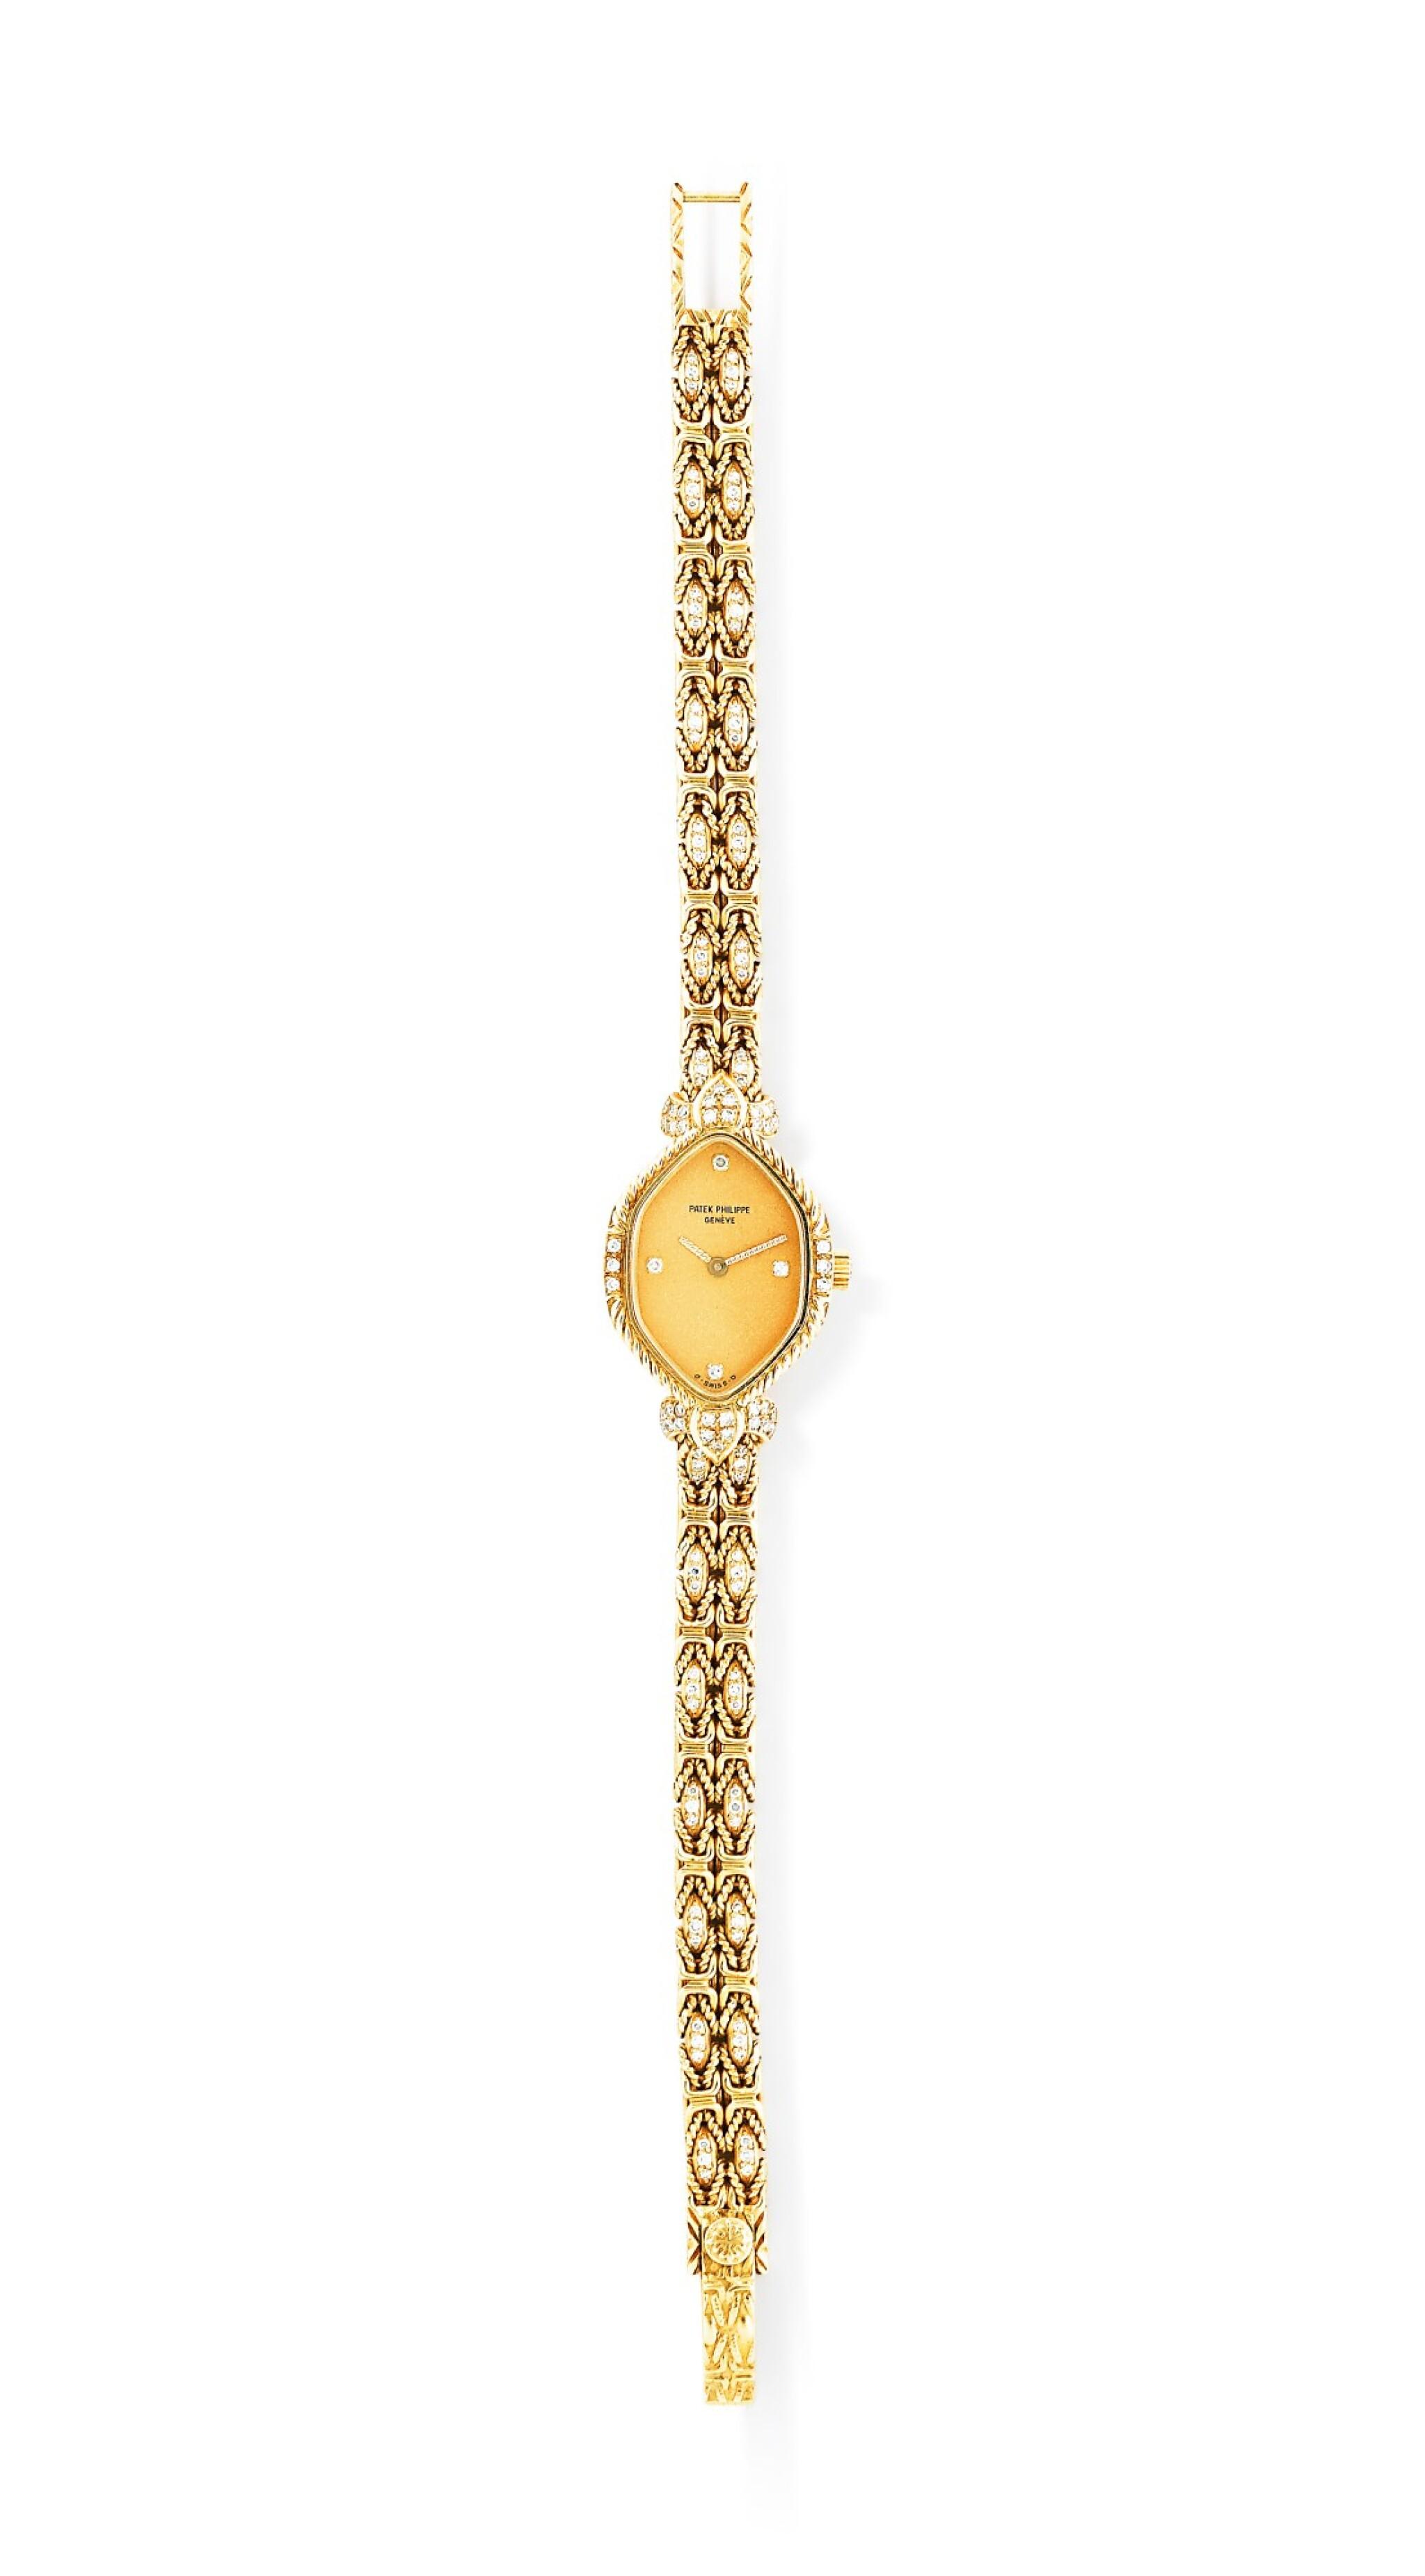 View full screen - View 1 of Lot 121. Patek Philippe | Montre bracelet de dame or et diamants | Lady's gold and diamond bracelet watch.